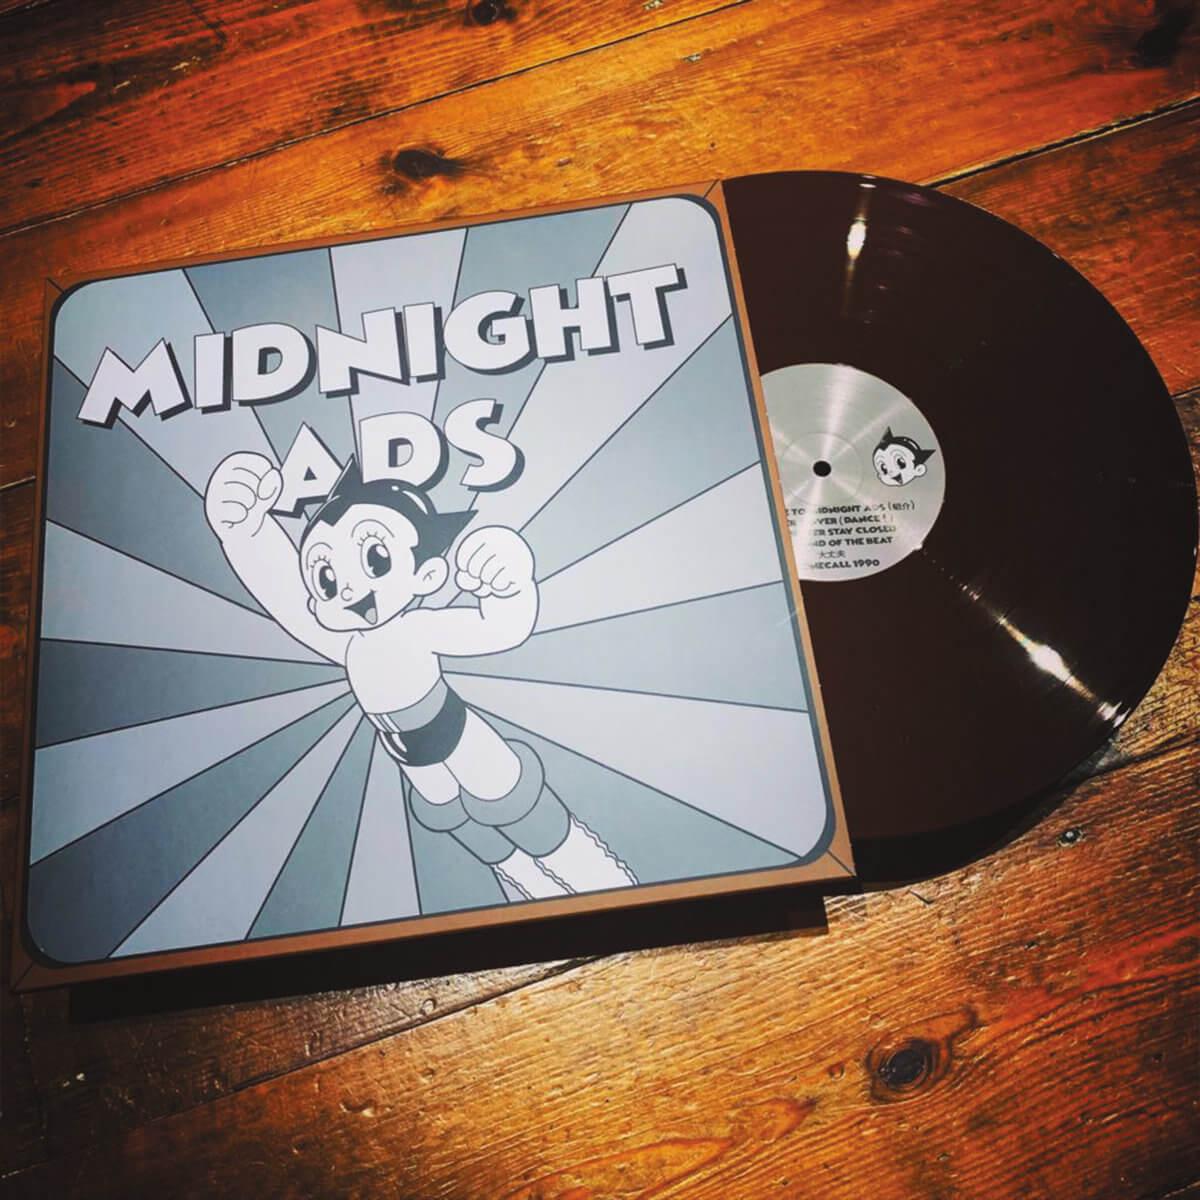 Midnight Ads by S U P E R F L A T スーパーフラット (Midnight Ads | Limited Edition Brown Vinyl Edition) 1